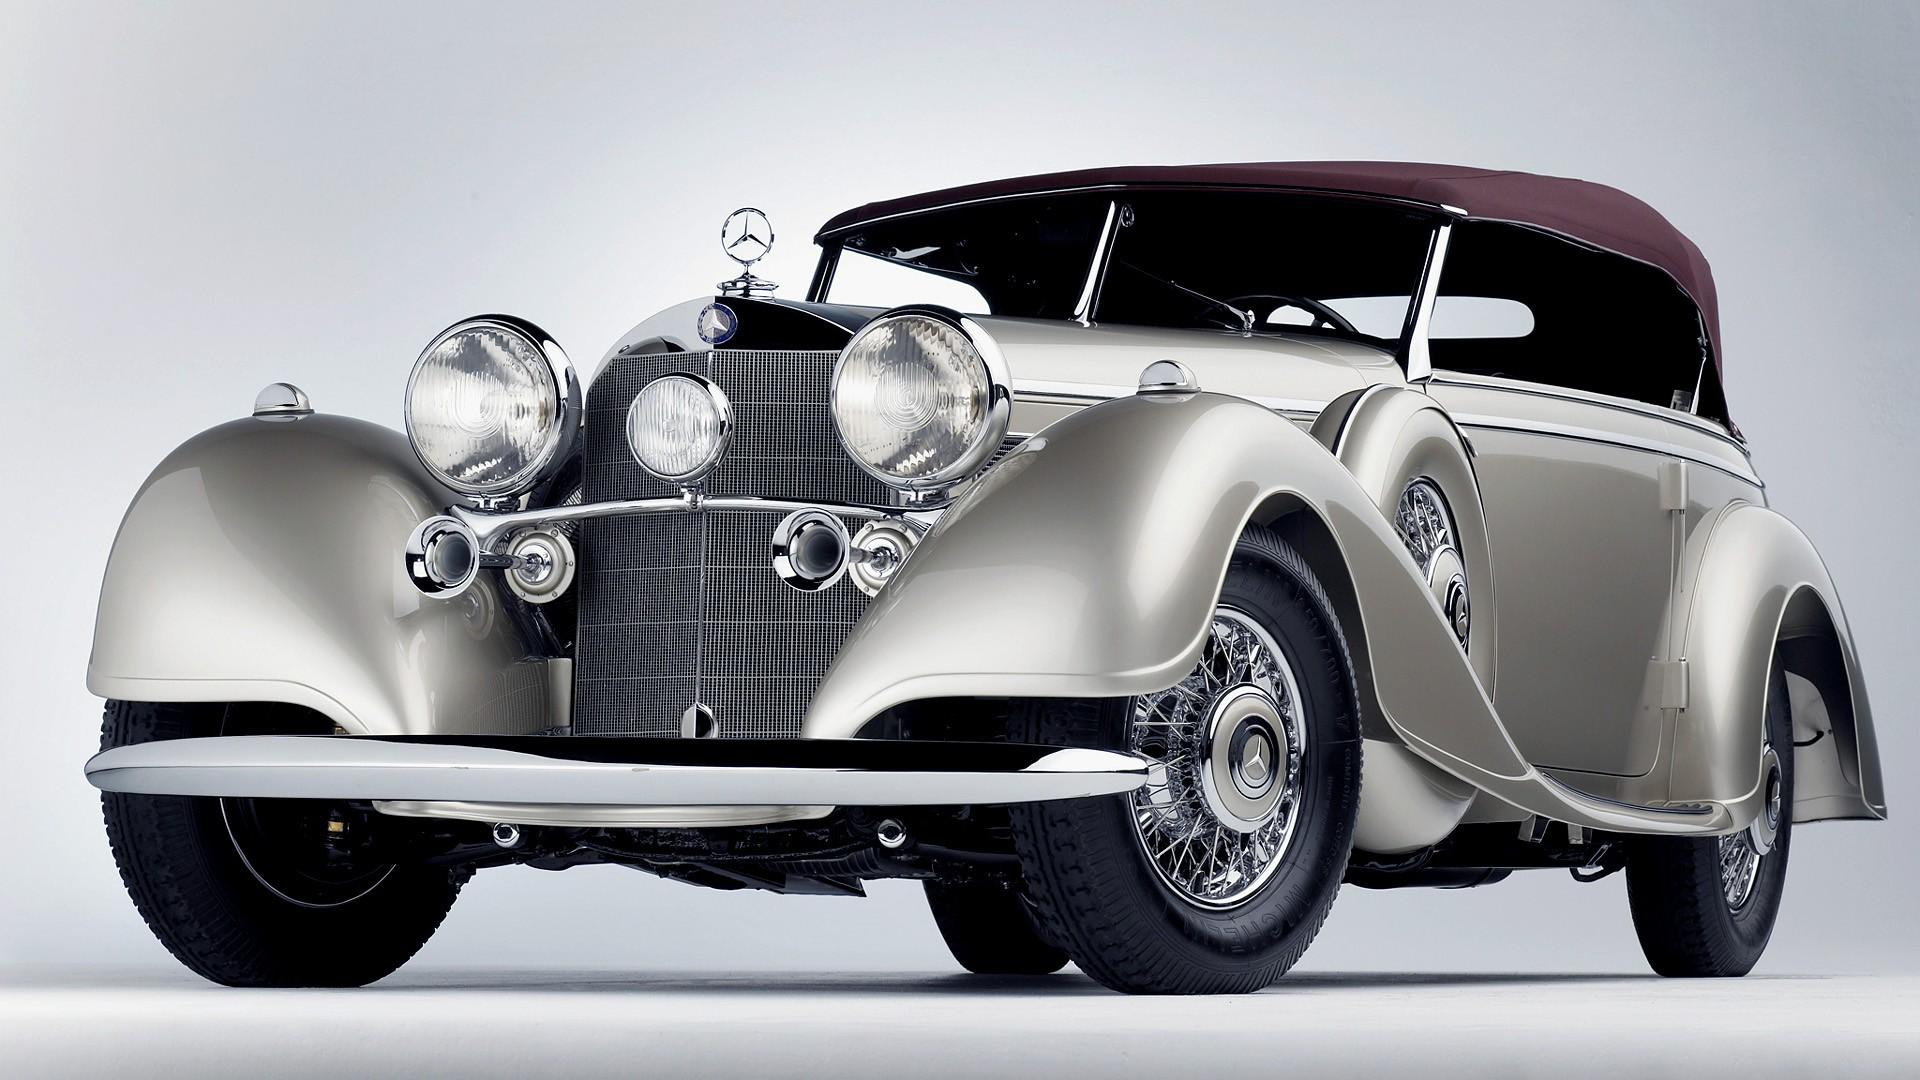 Vintage cars classic cars mercedes benz wallpaper for Mercedes benz vintage cars